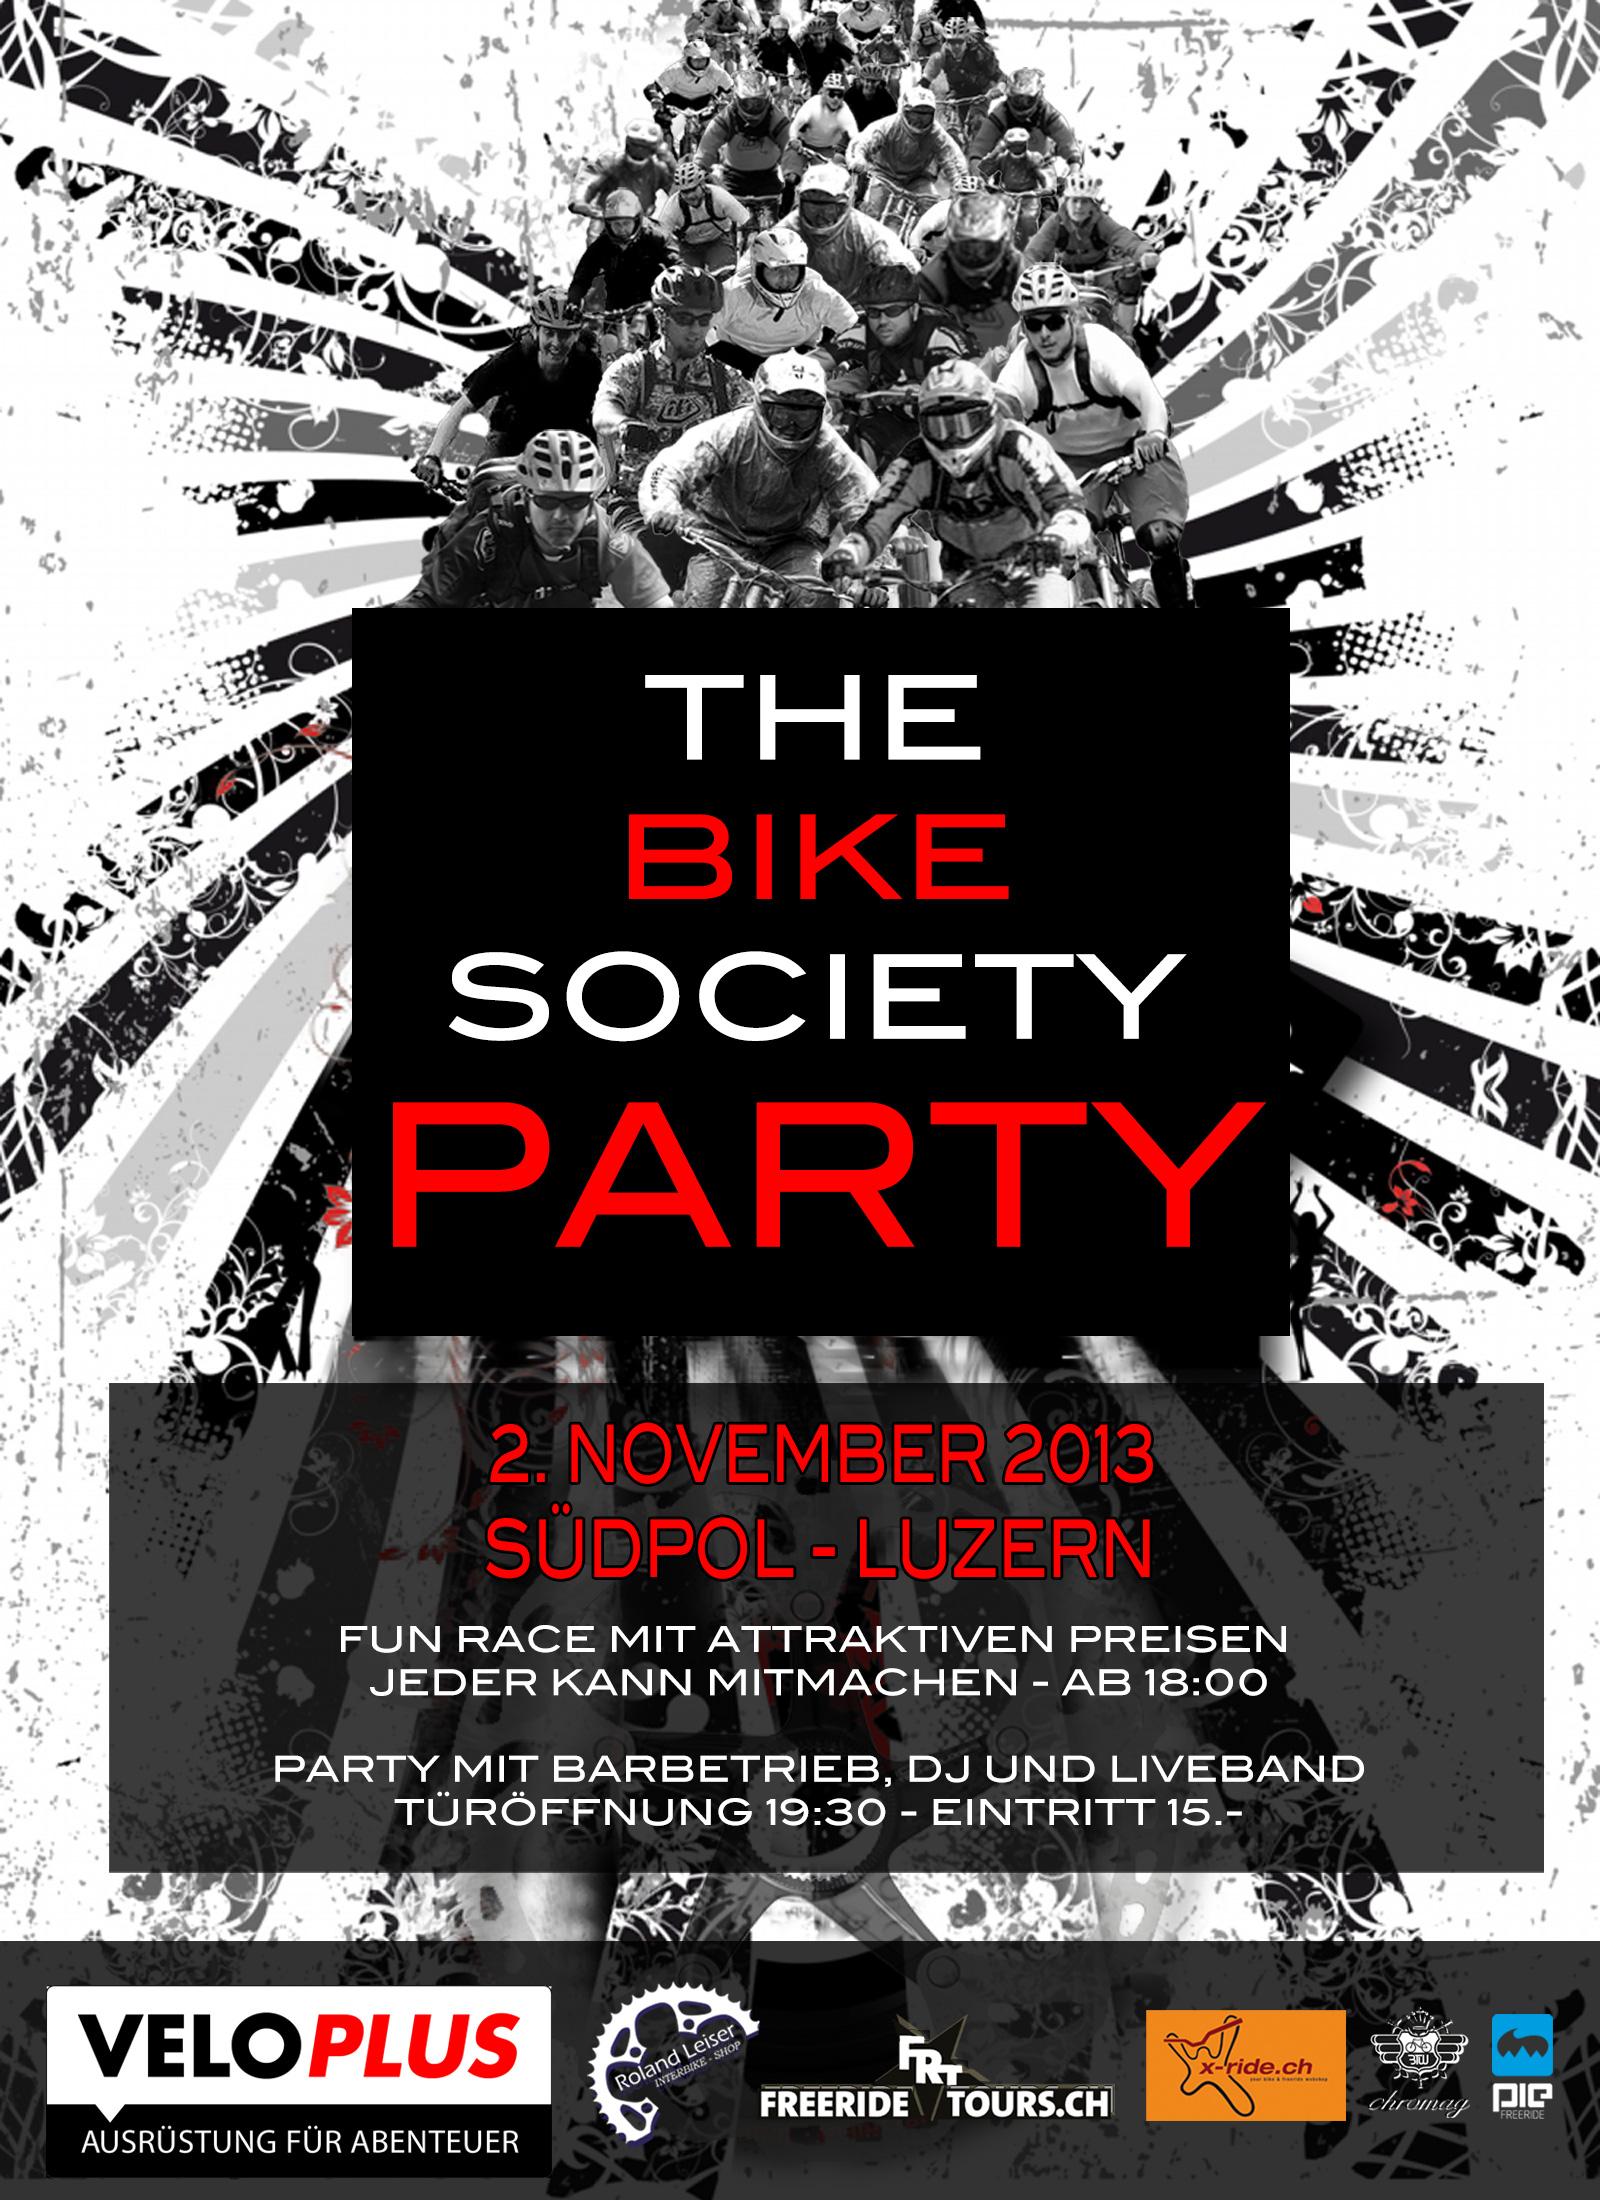 Bike society flyer party veloplus x-ride interbike freeridetours